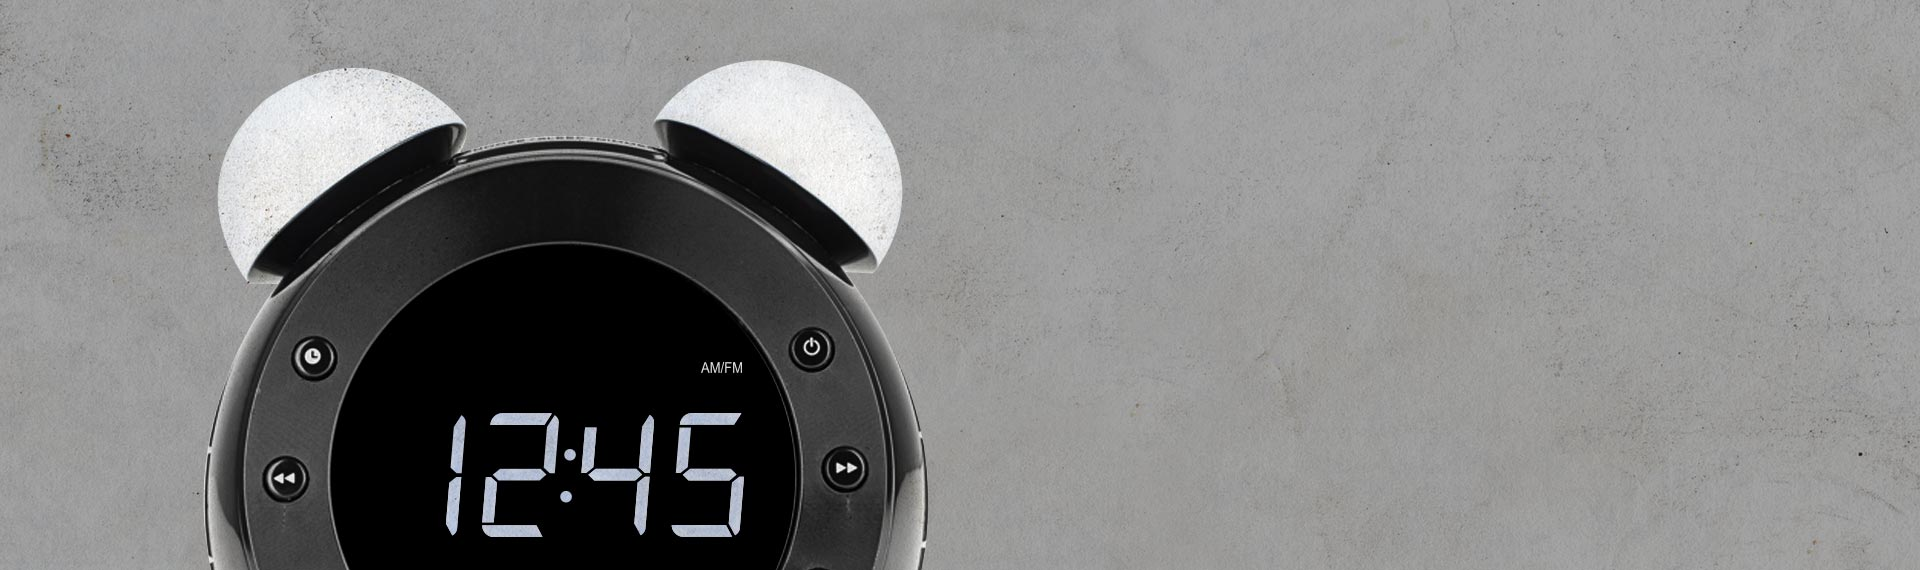 CR35 Clock Radiodate